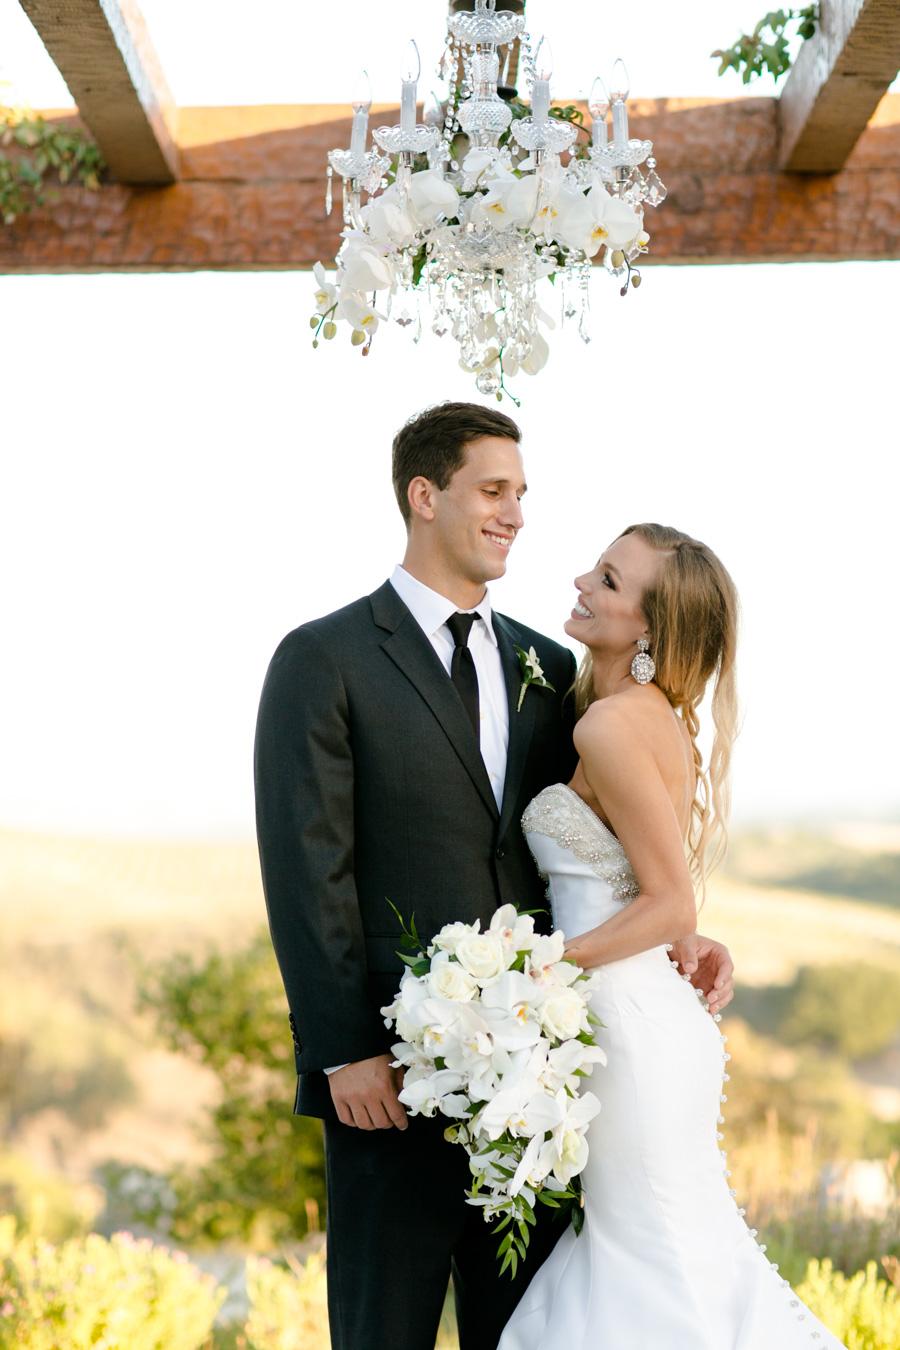 Croad Winery Paso Robles Wedding Ceremony